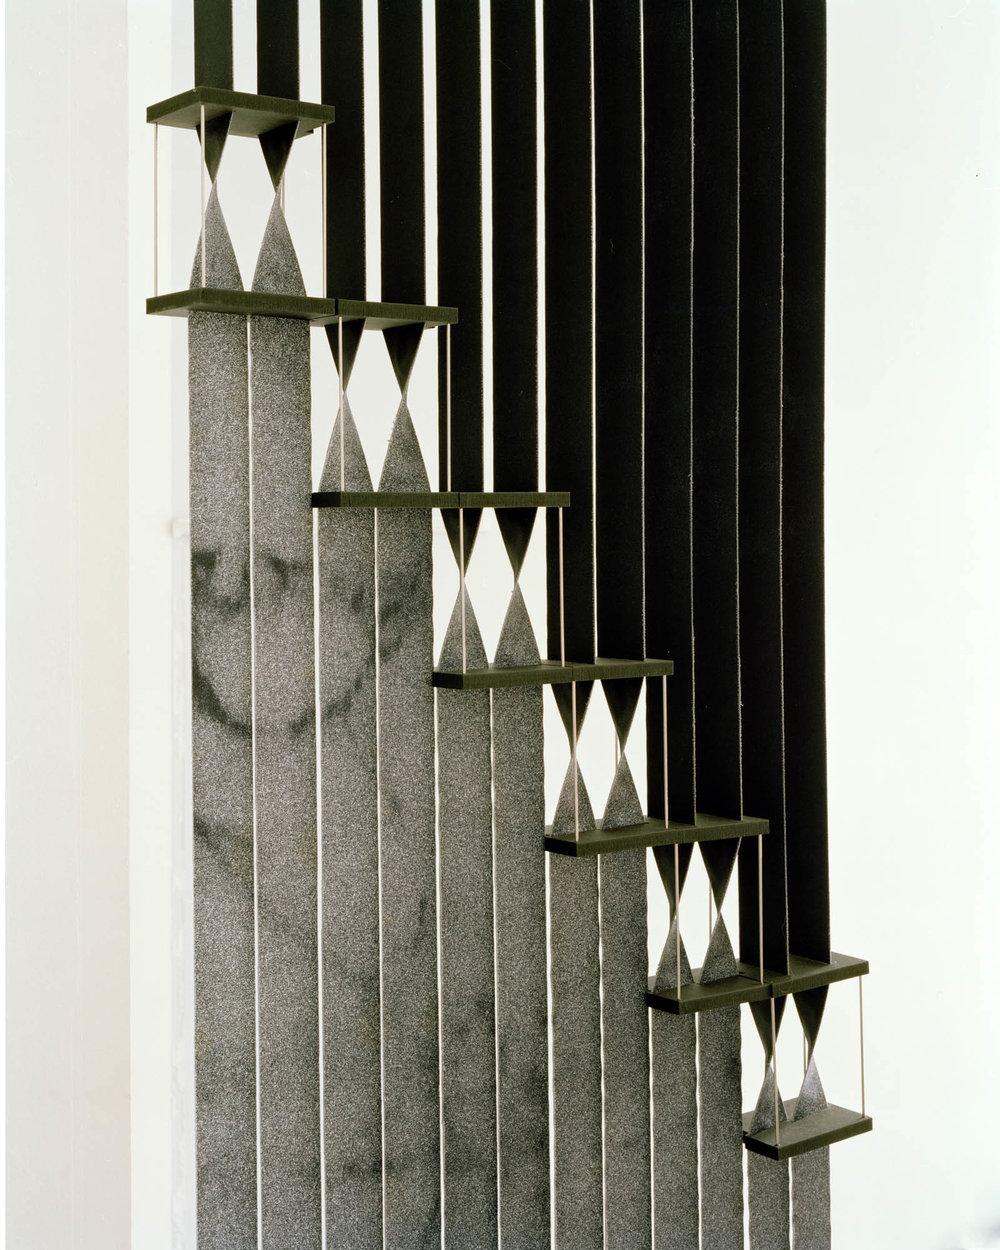 Kia-marblesteps.jpg